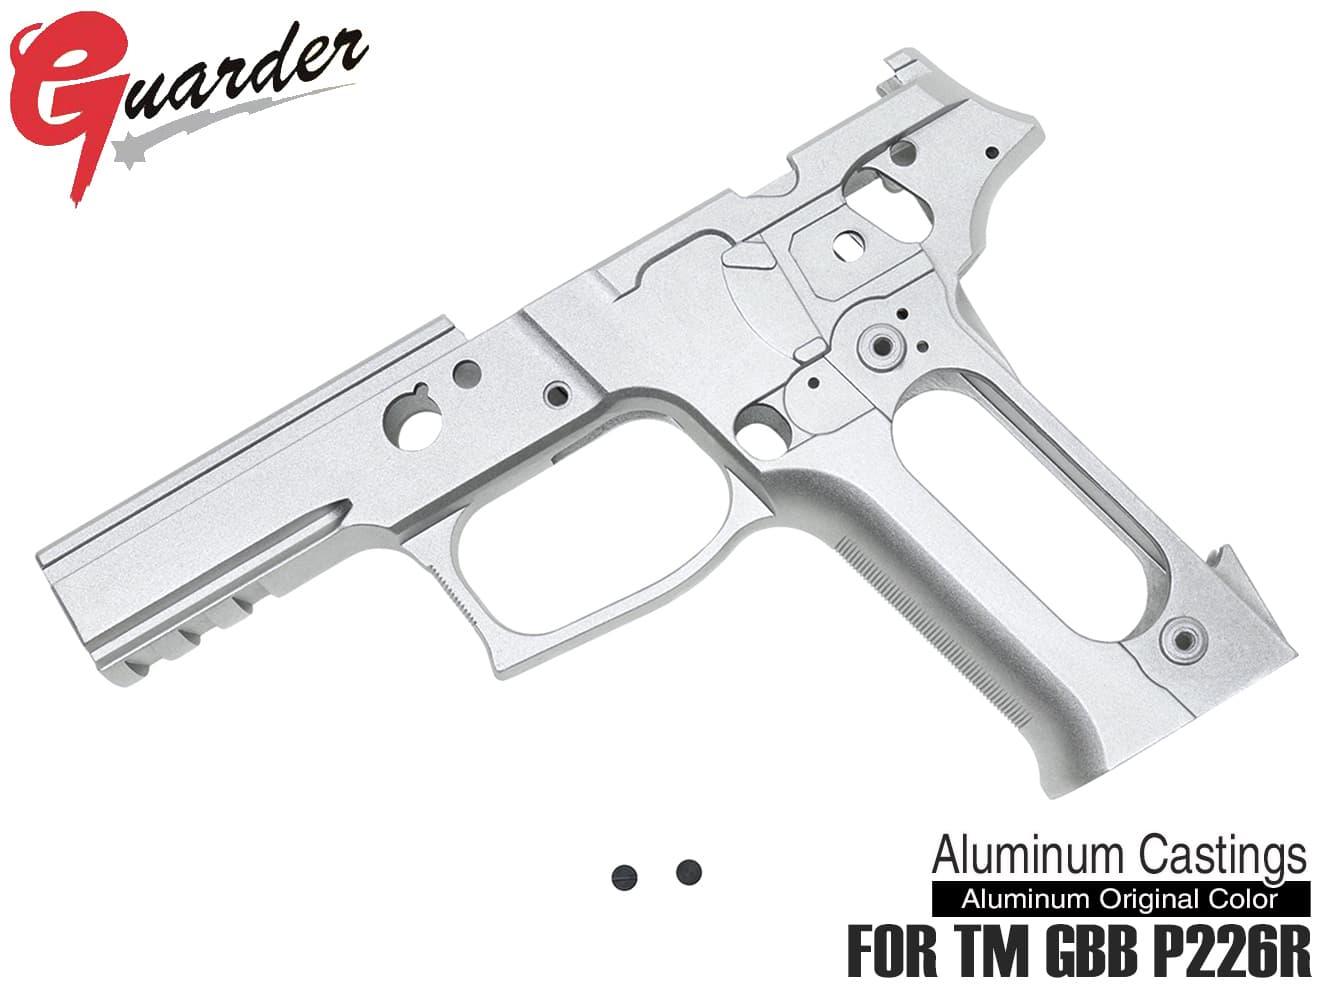 P226-62(A)■GUARDER P226 RAIL フレームKIT Late Version Marking マルイ P226R用◆オリジナルアルミカラー TM GBB P226 RAIL対応 カスタムフレーム